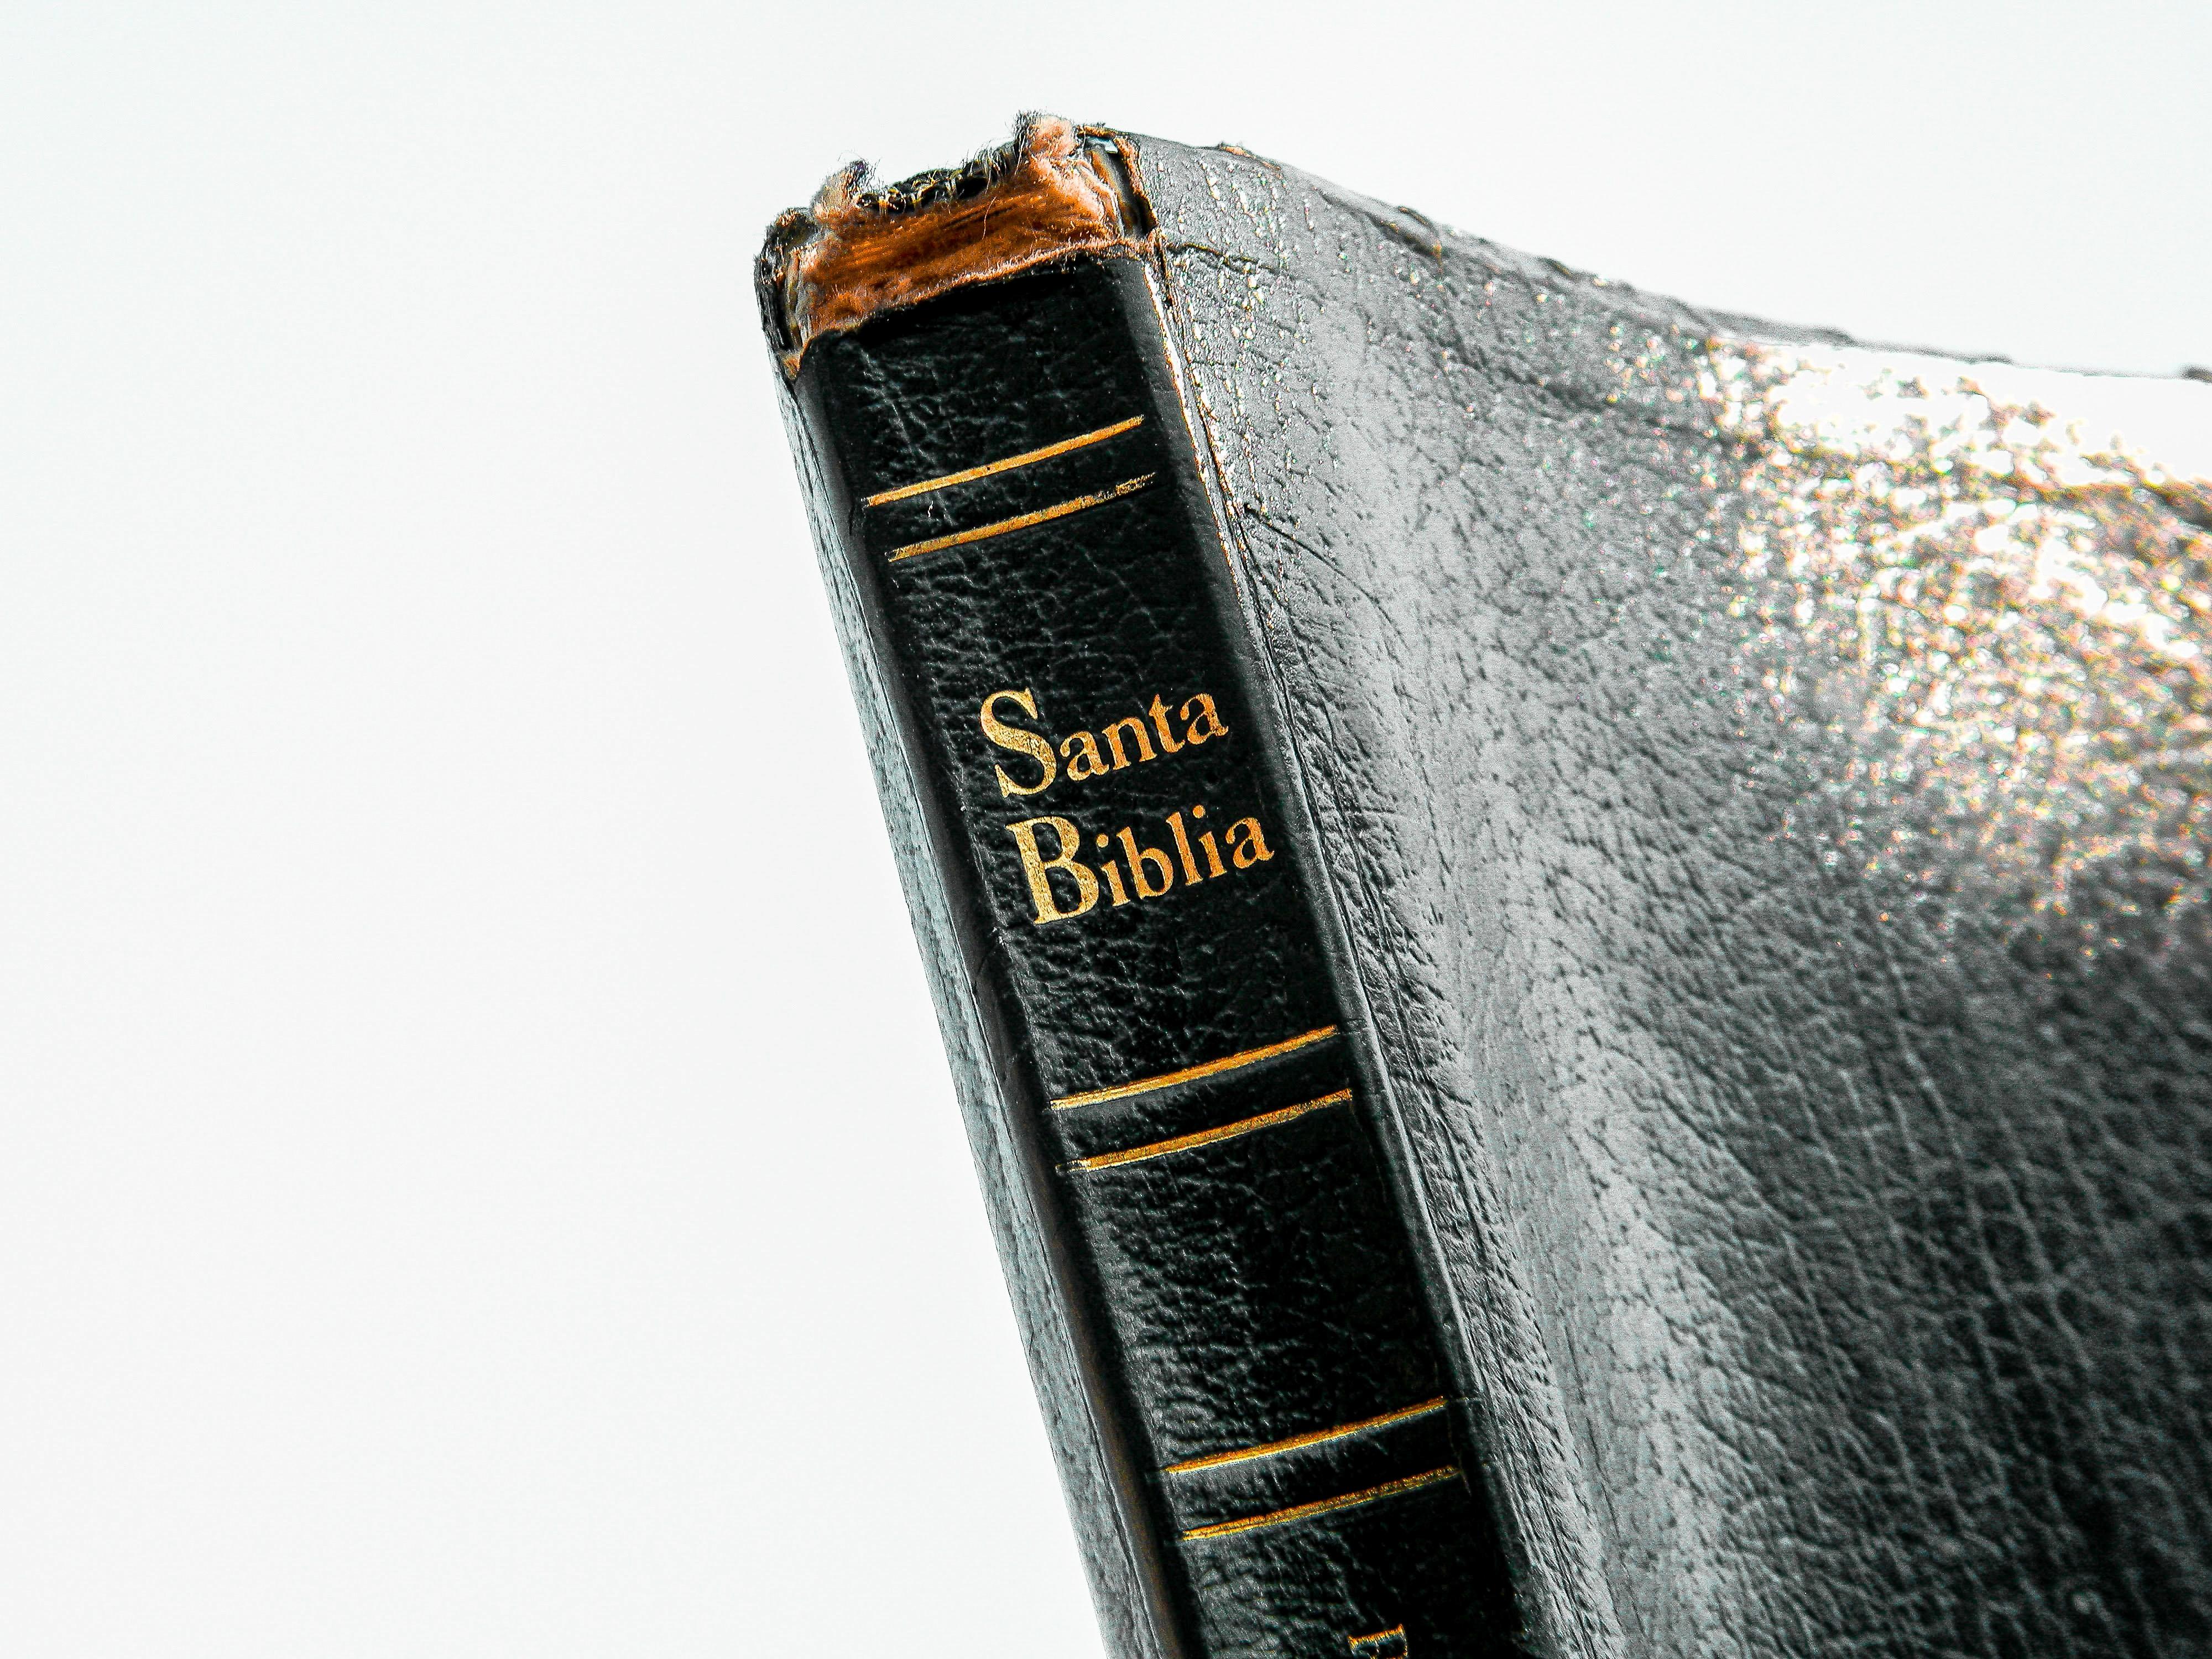 Santa Biblia book